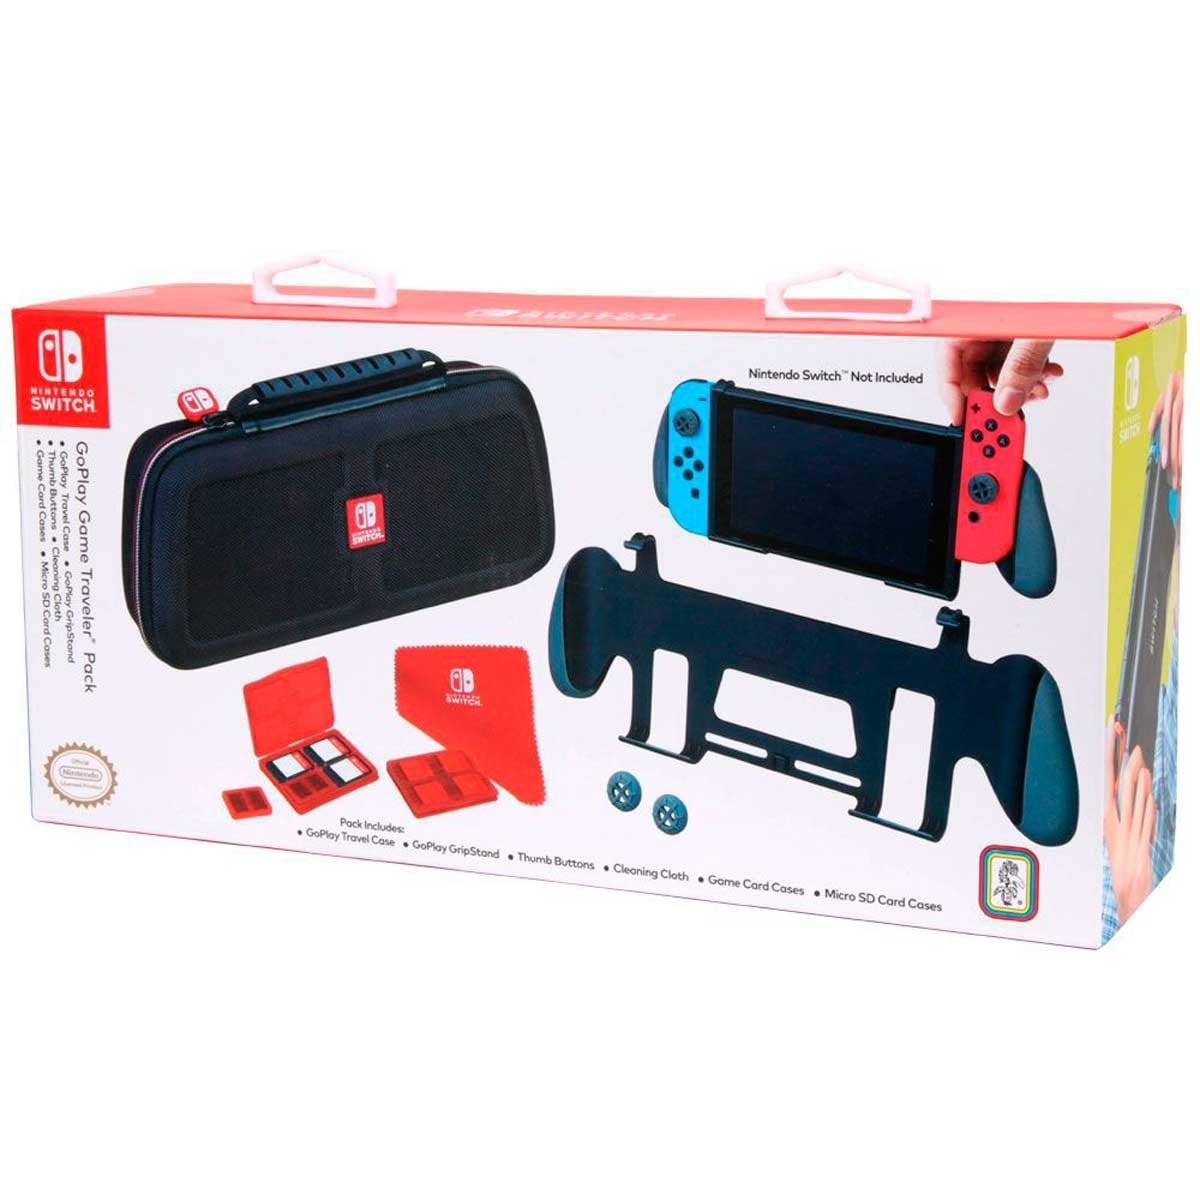 Nintendo Switch Kit Estuche de Viaje Nintendo Switch